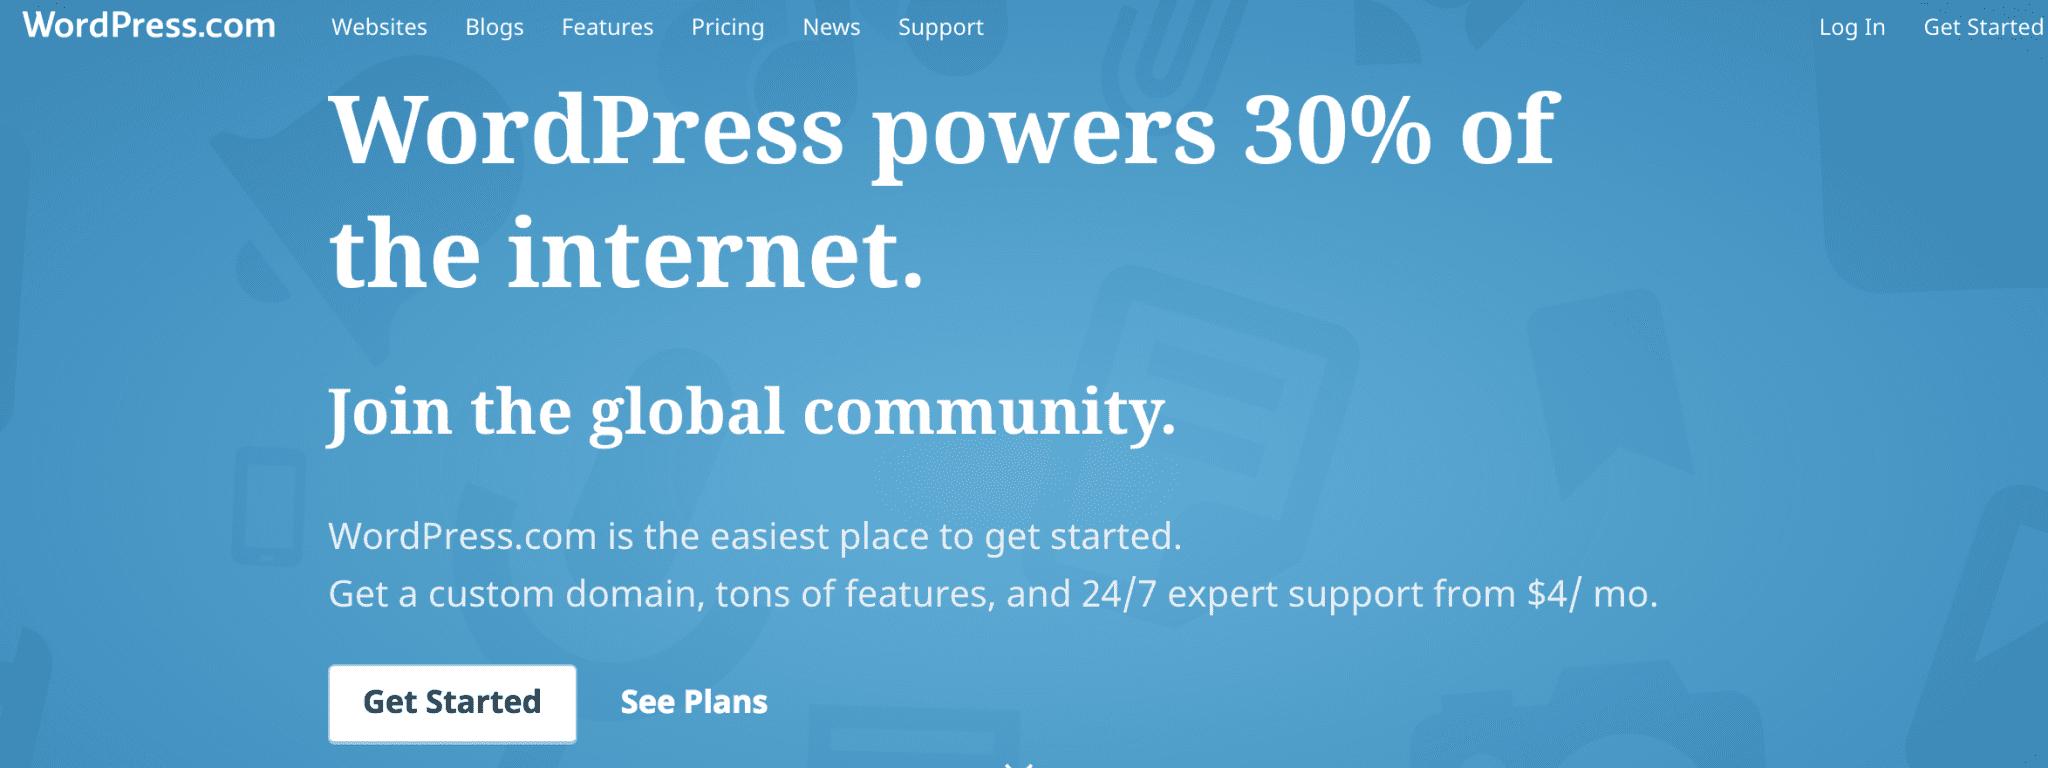 WordPressCalendarIntegration